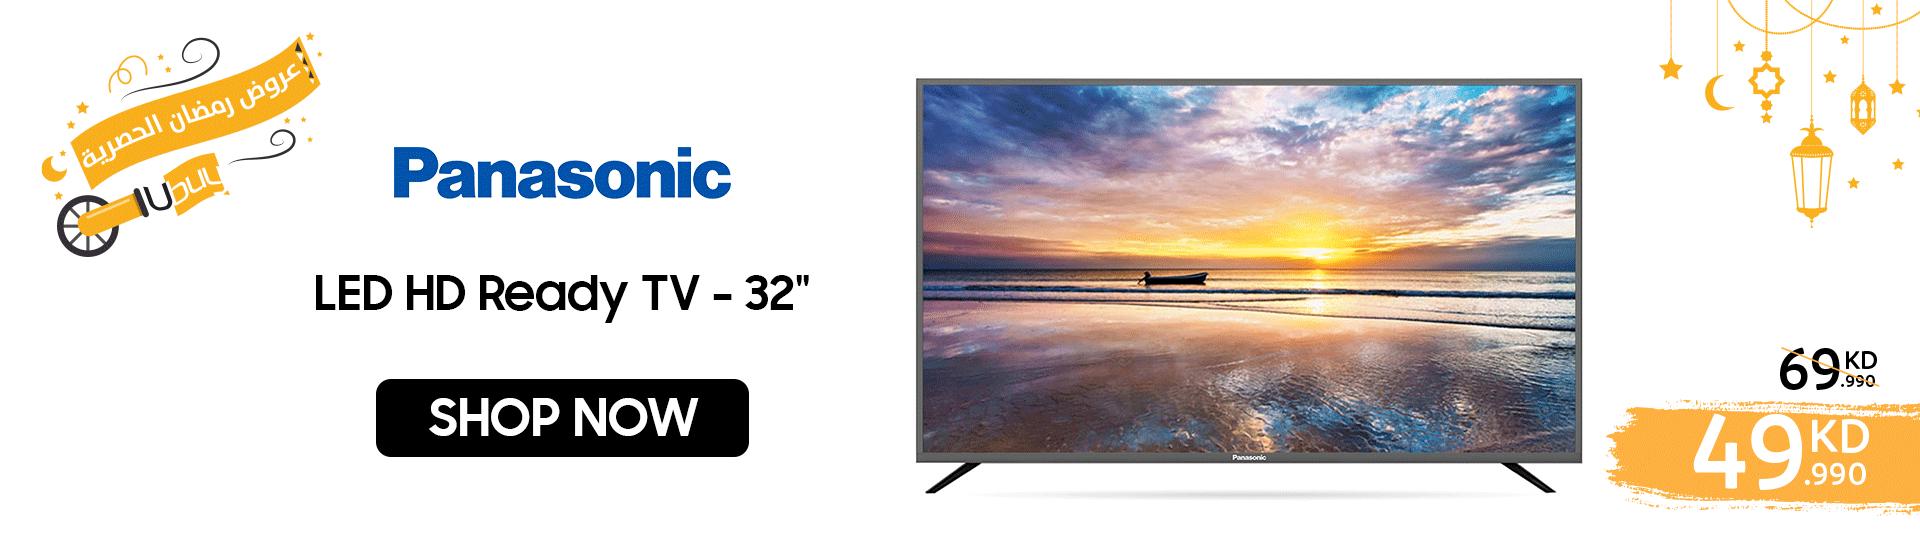 Panasonic - LED HD Ready TV